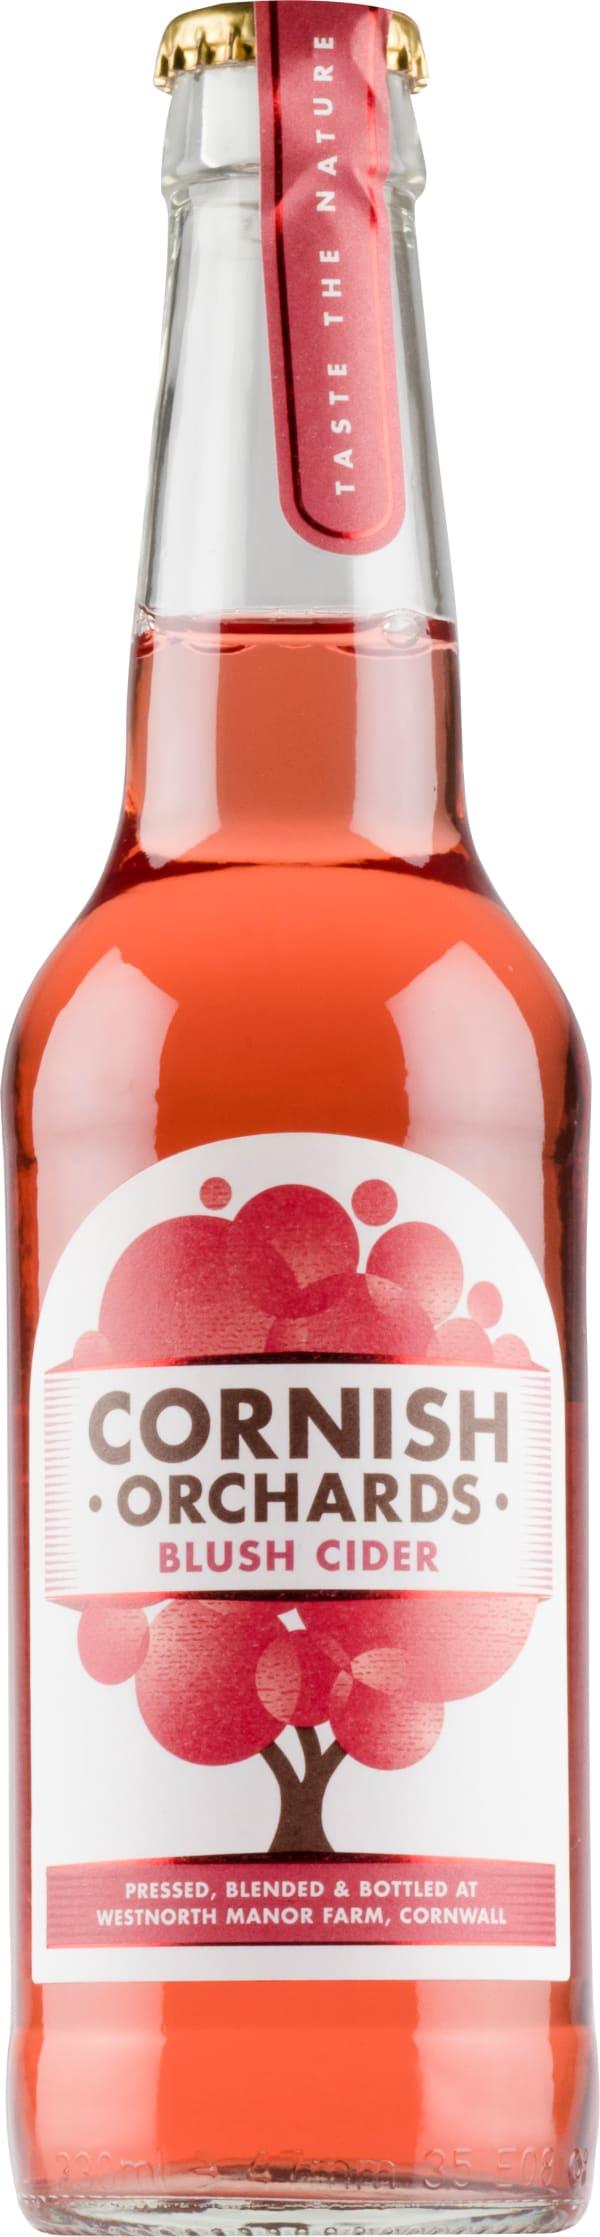 Cornish Orchard Blush